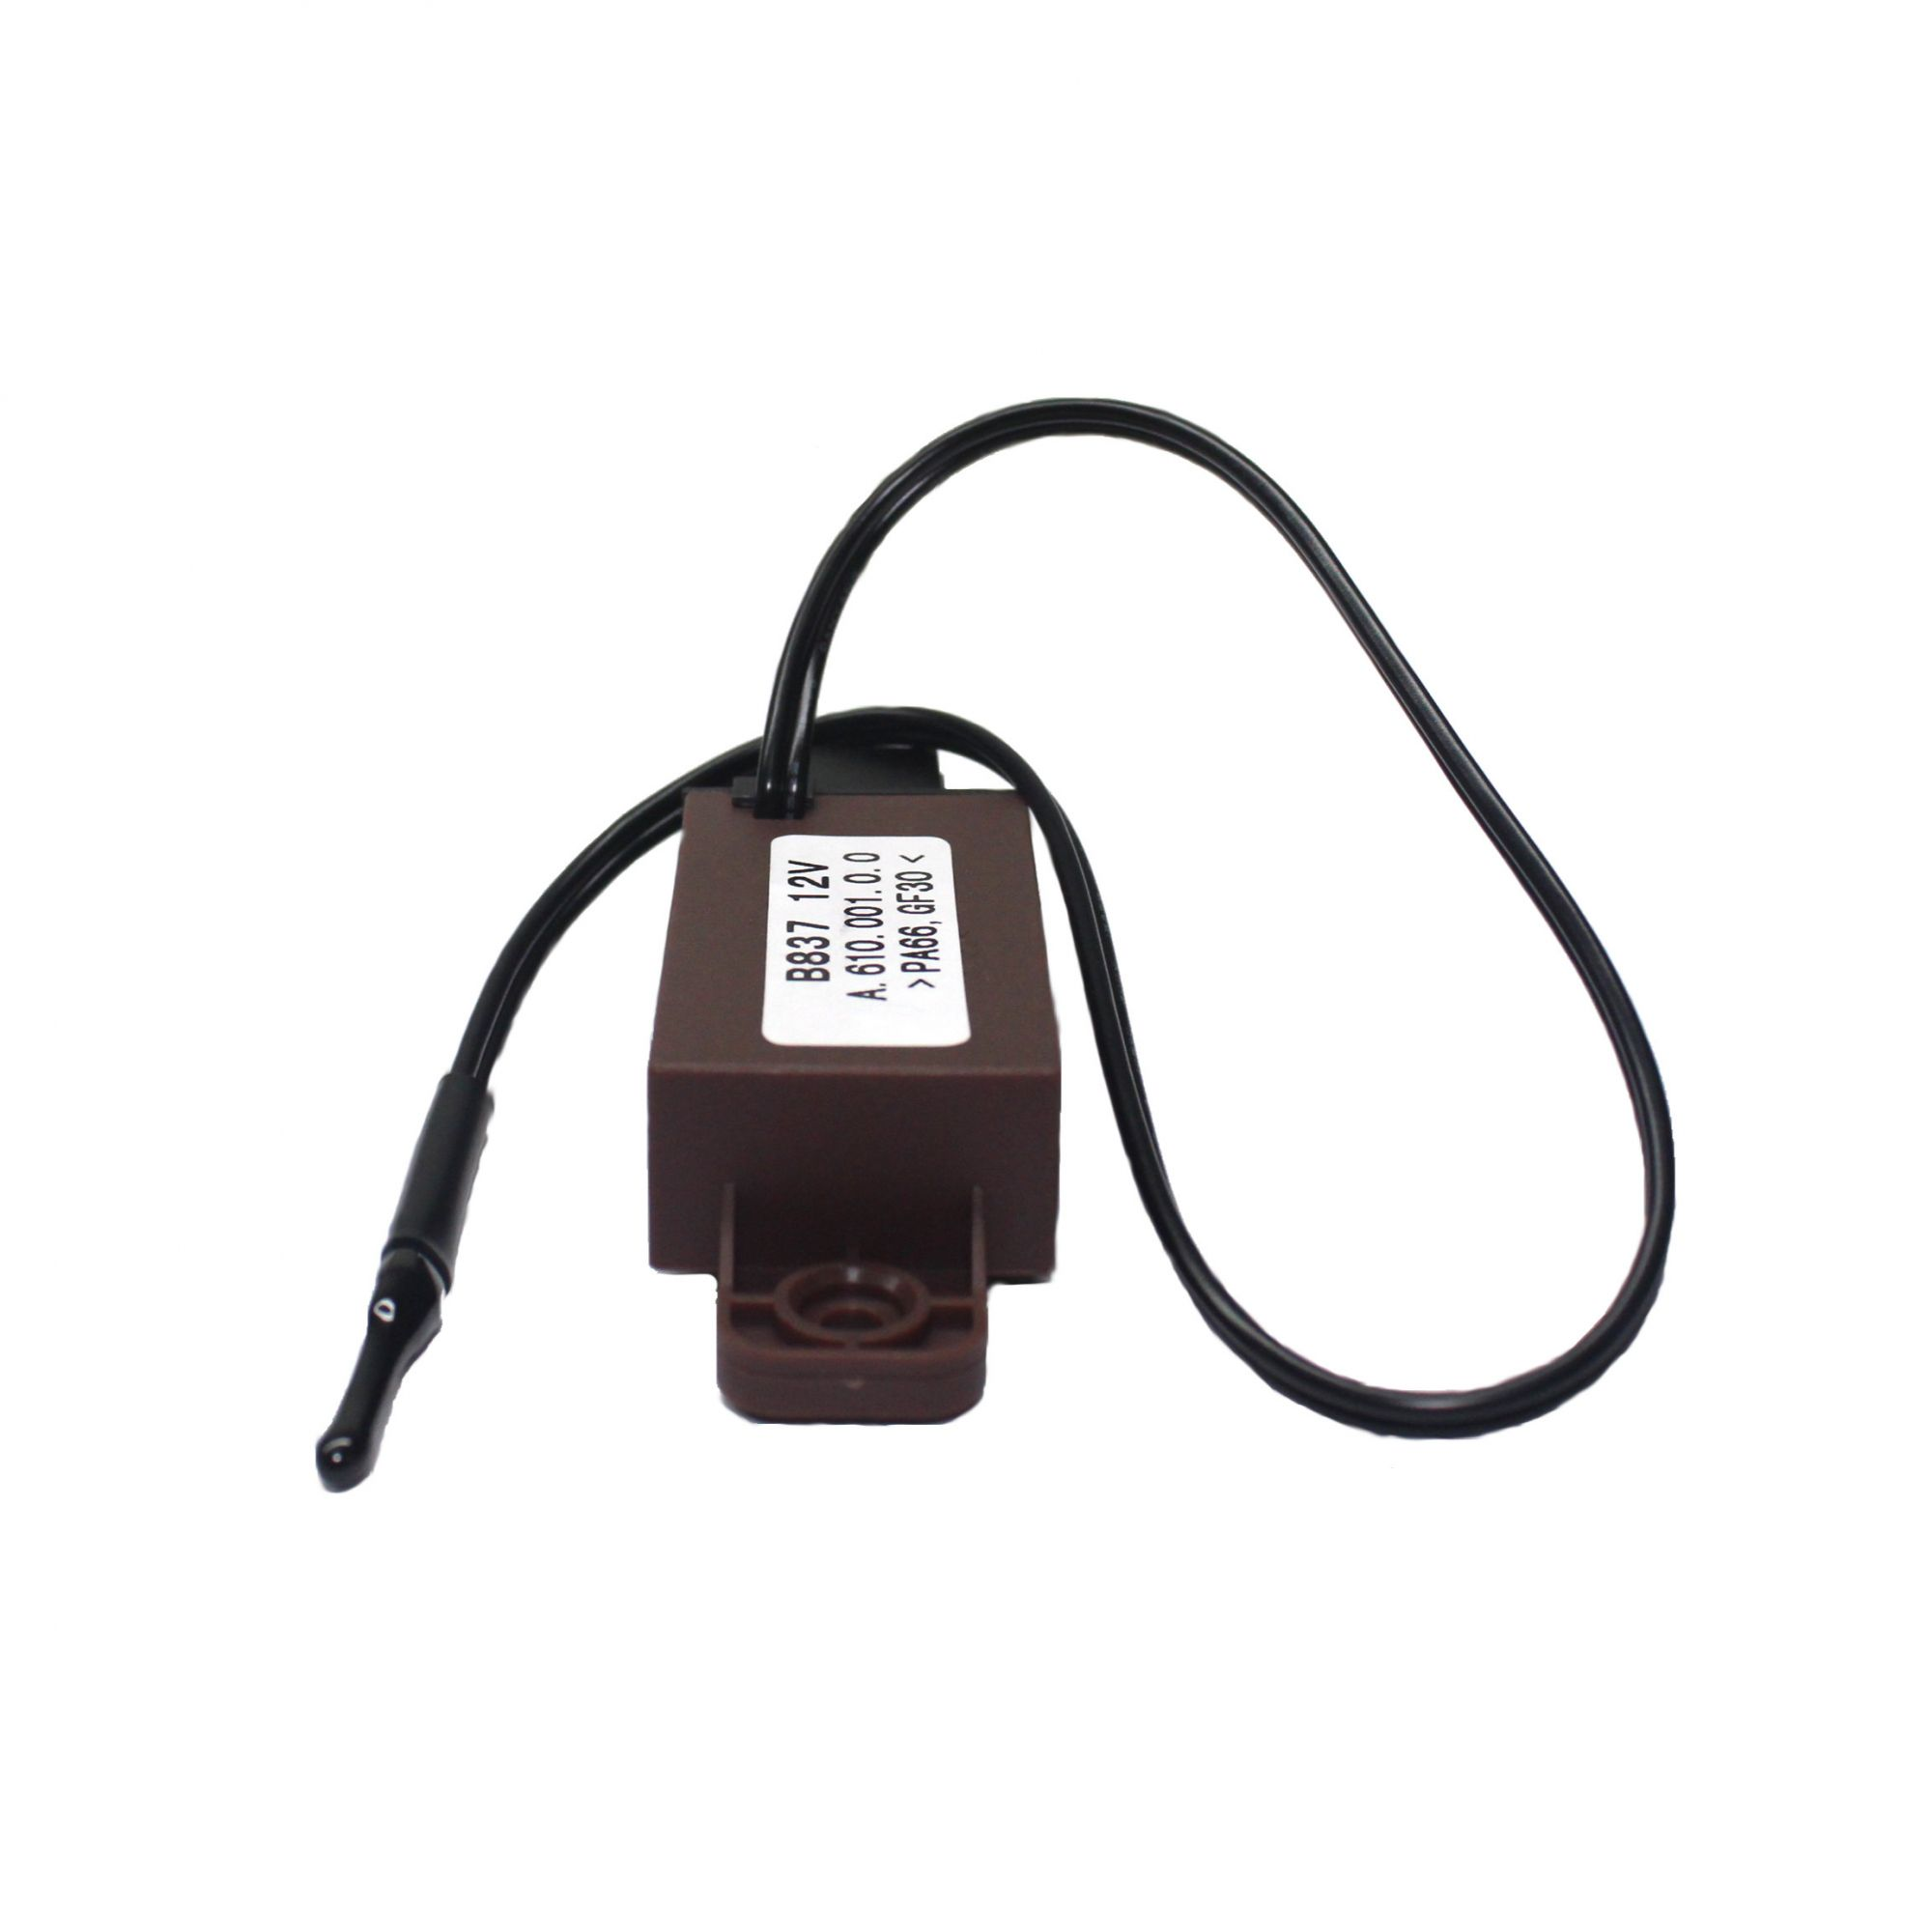 Sensor Termostato Caixa De Ar Palio, Fiesta, Tempra - C/ Chicote